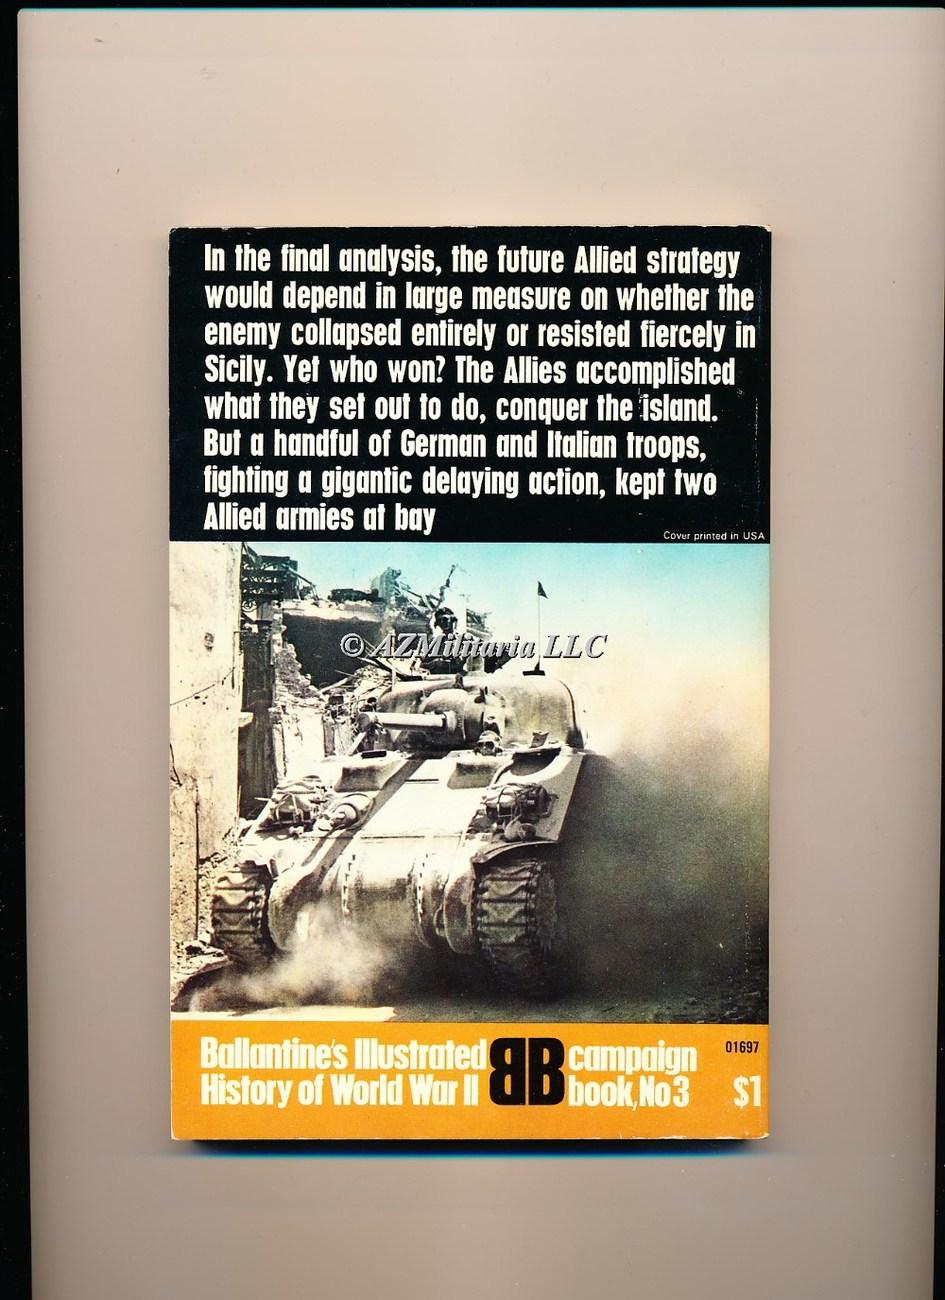 Sicily Whose Victory( Campaign Book, No 3)